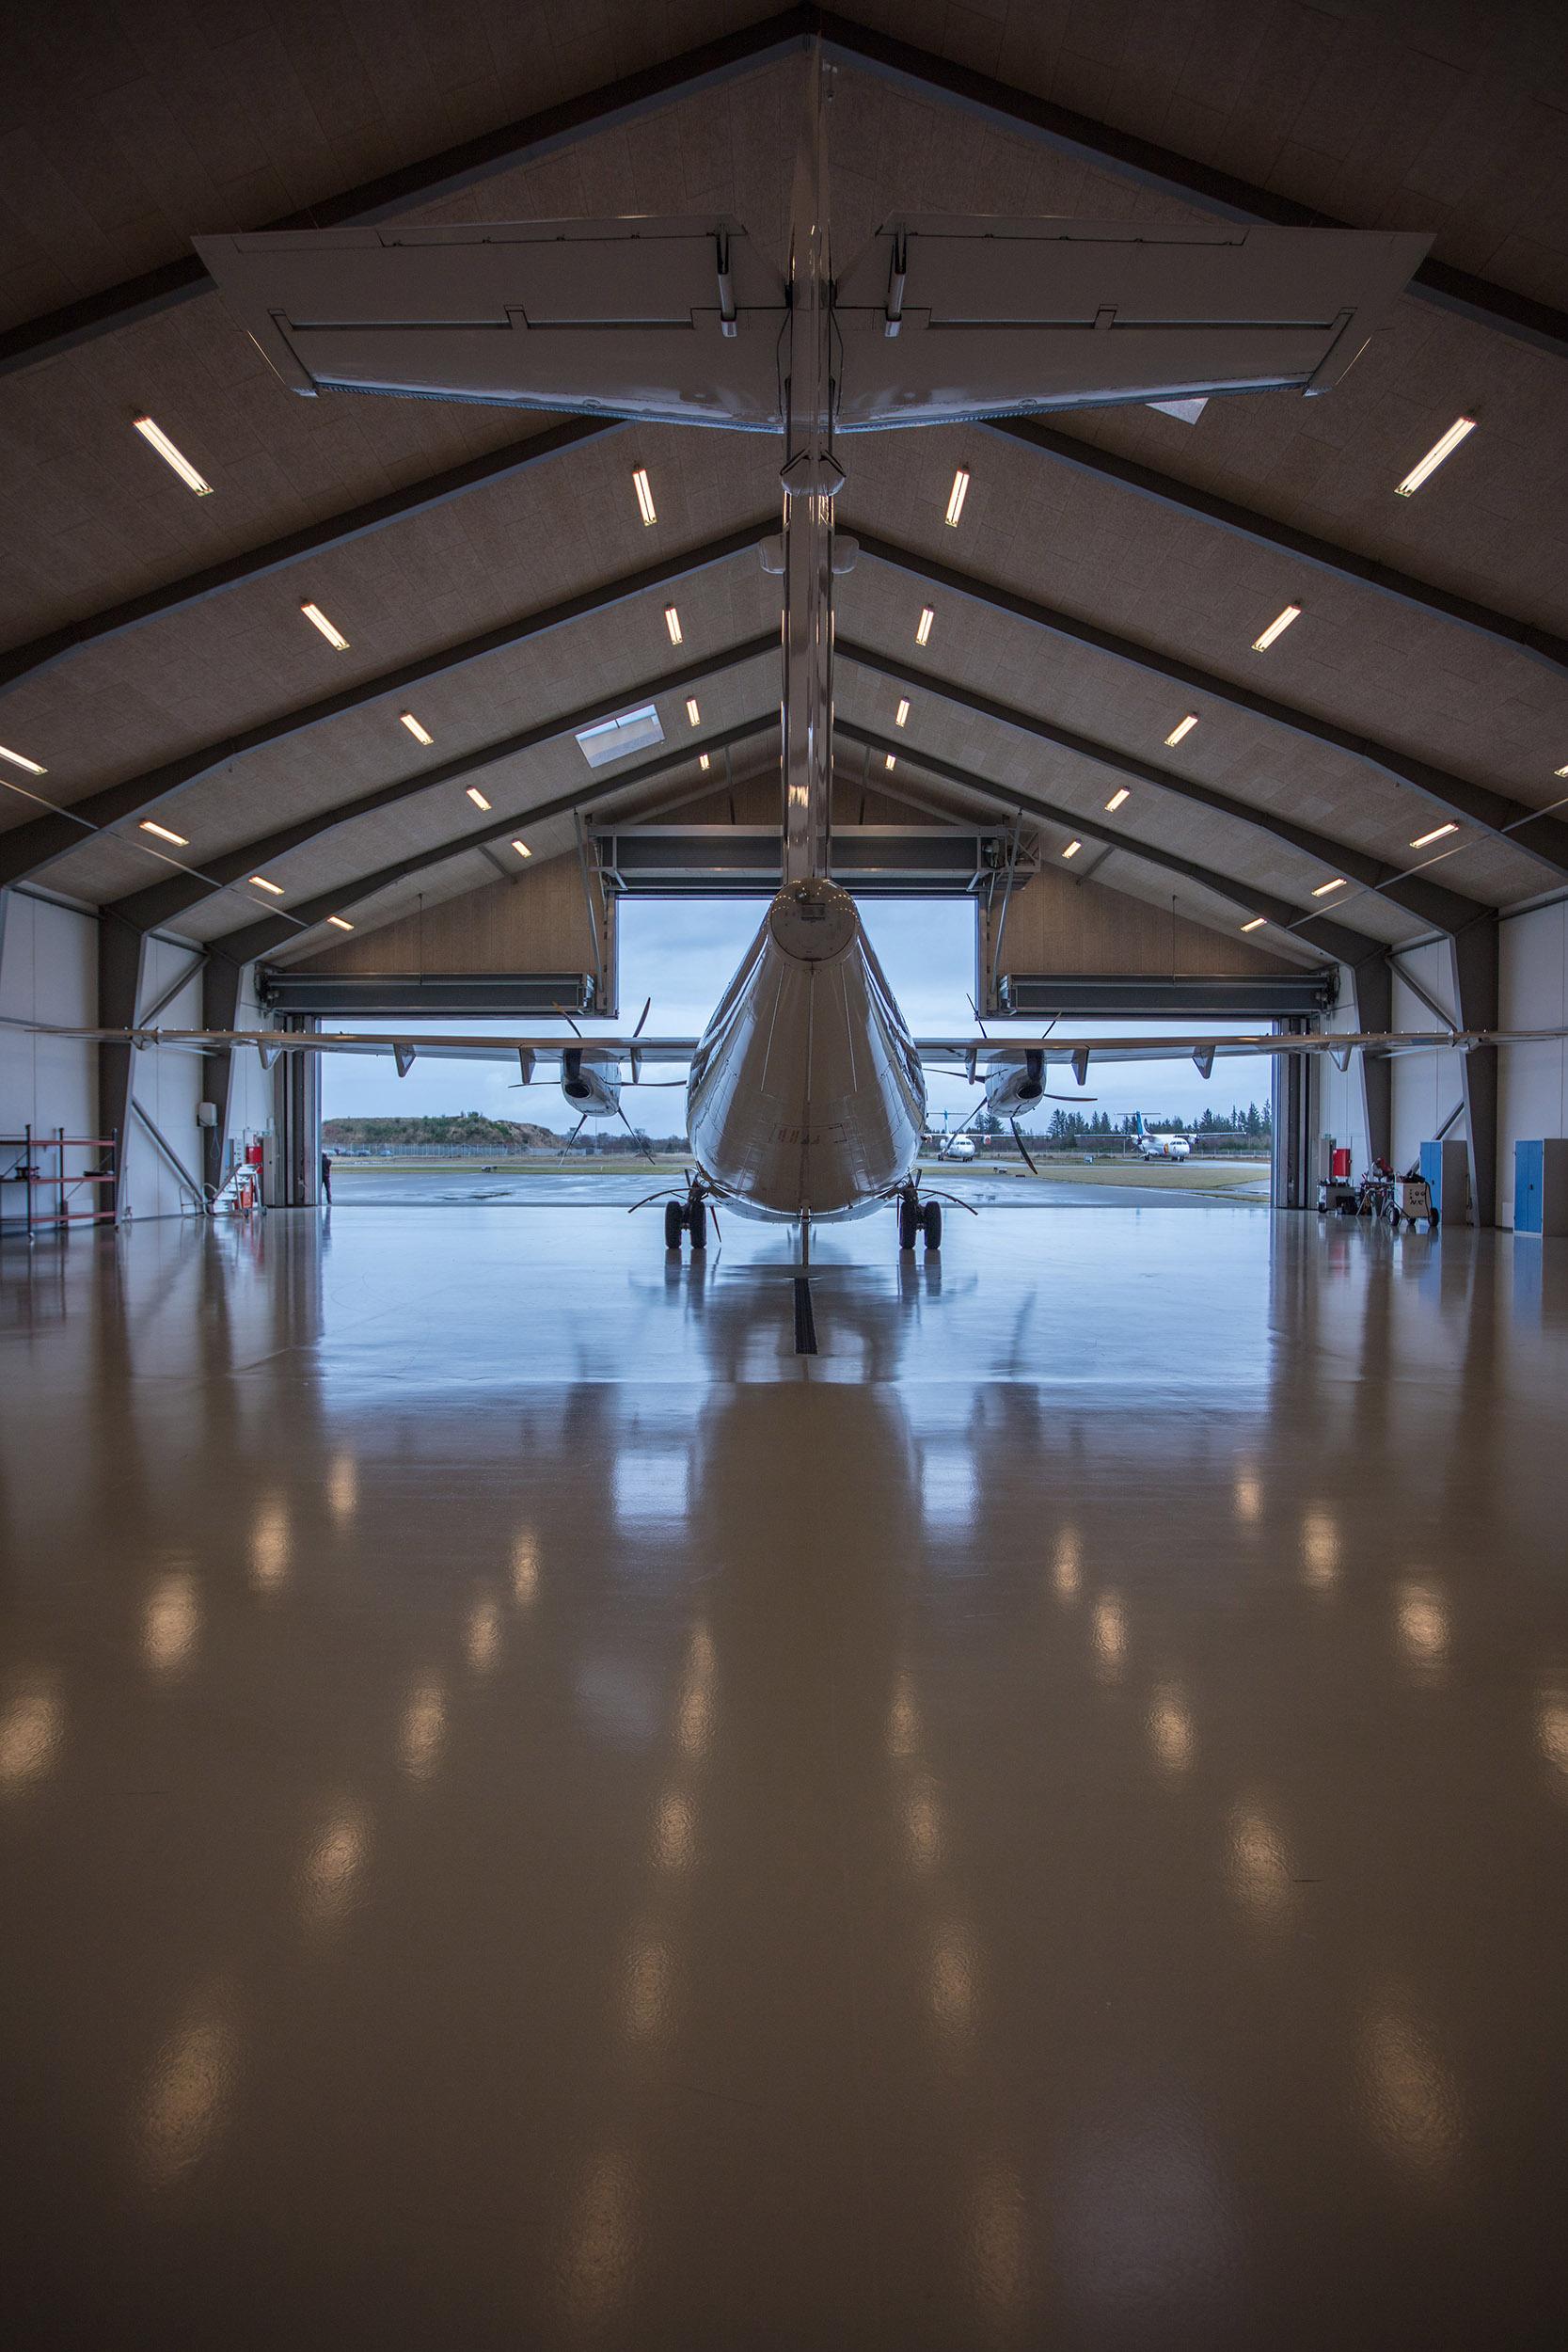 Nordic Aviation Capital